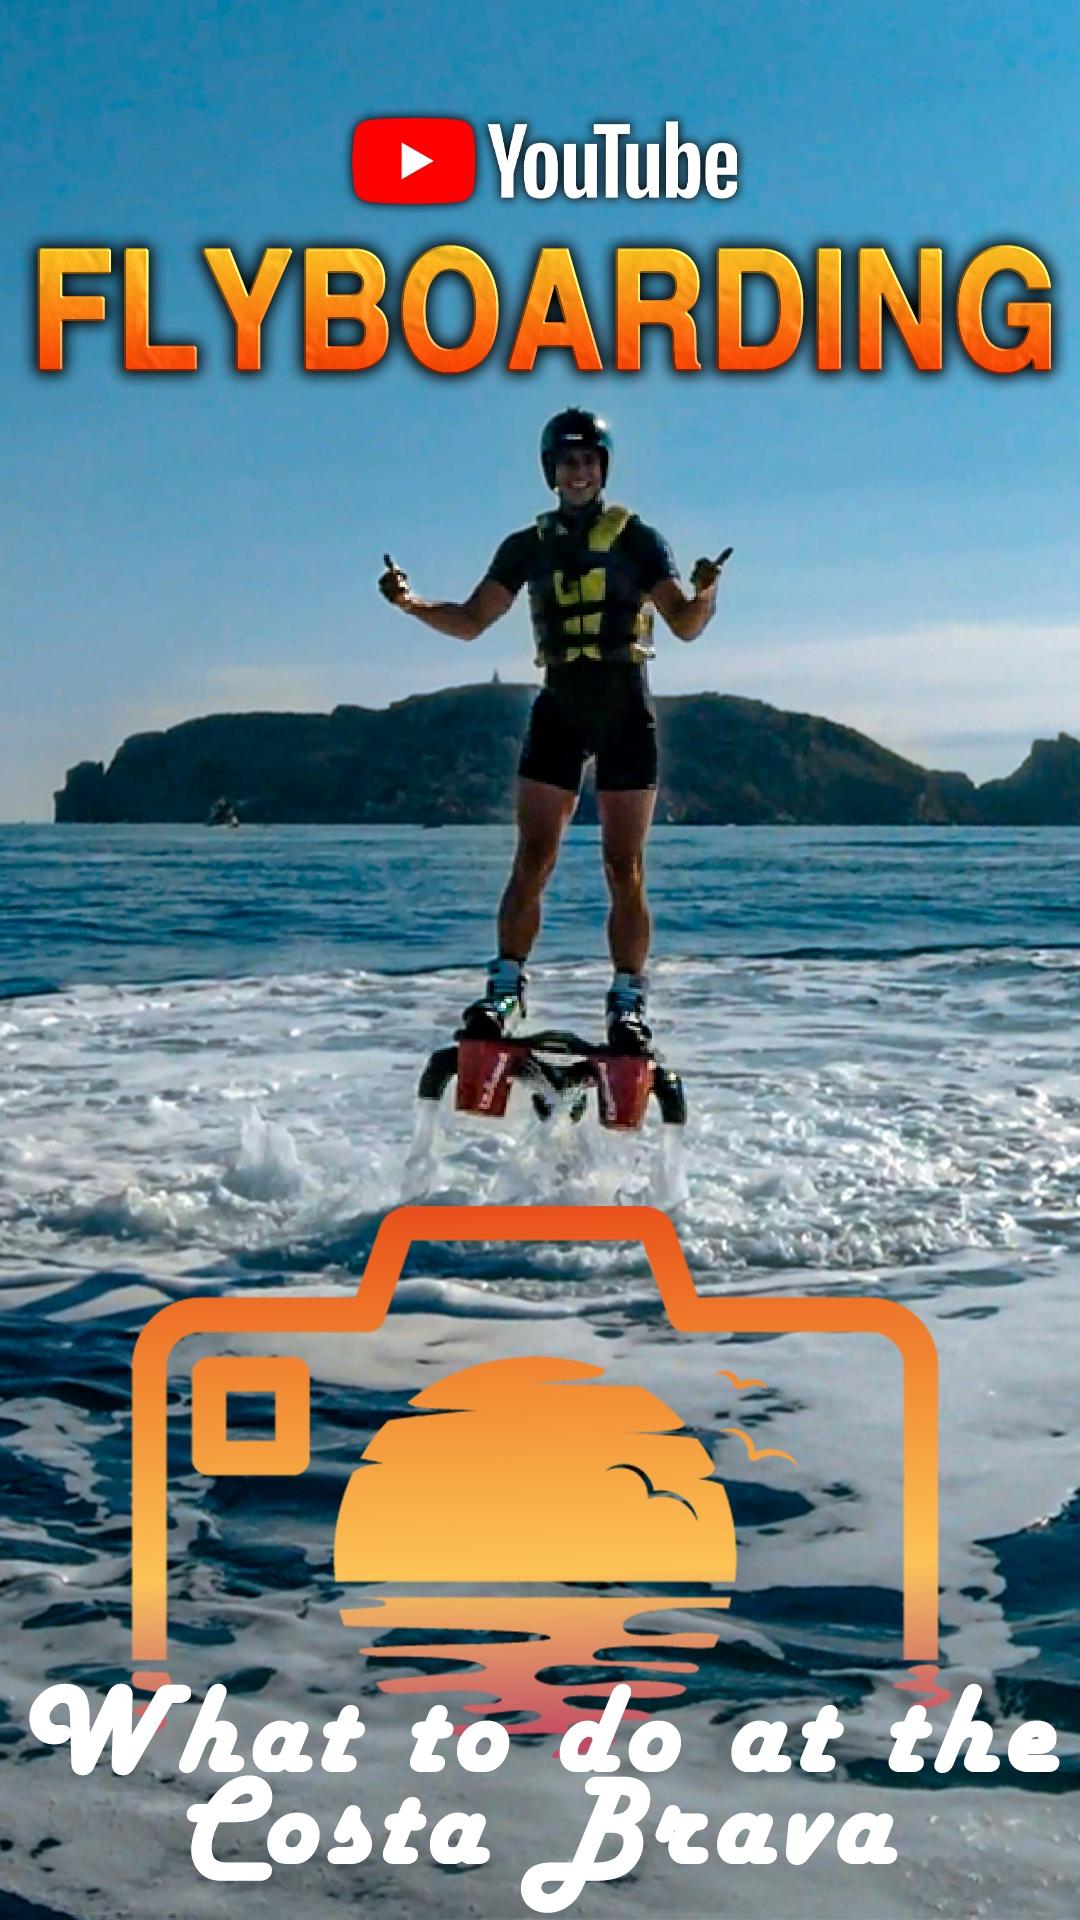 What to do at the Costa Brava Series Youtube Costa Brava Vibes Matt EnlaCosta Flyboard Medes Islands Lass Dive Estartit Sea Actionsports